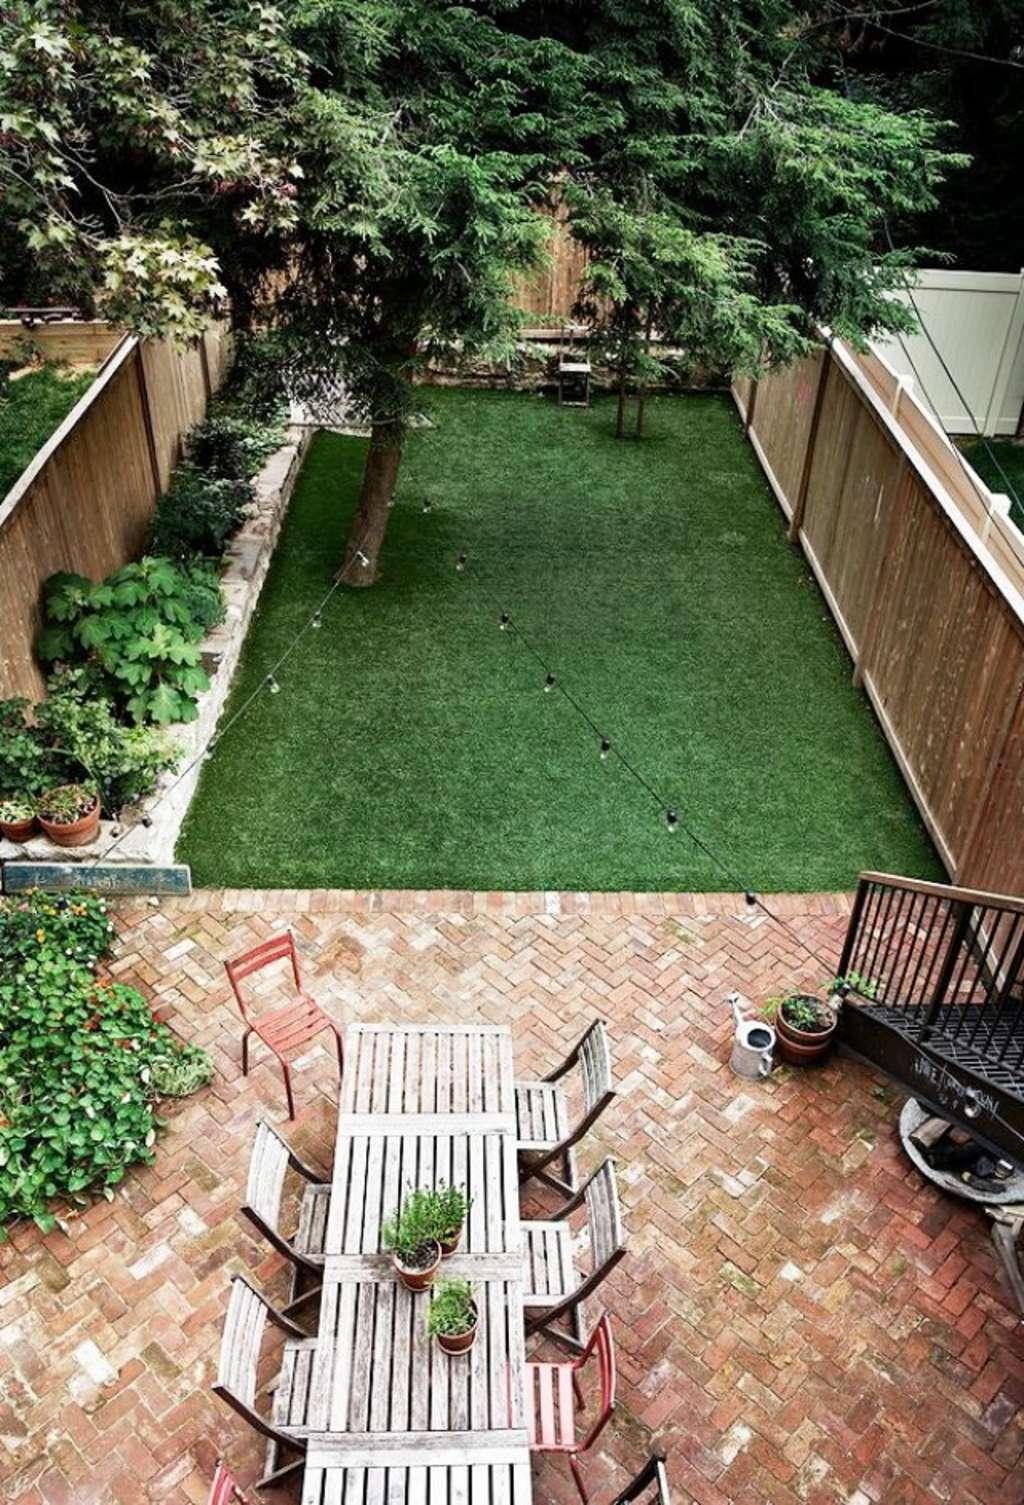 Outdoor Look We Love: Herringbone Brick